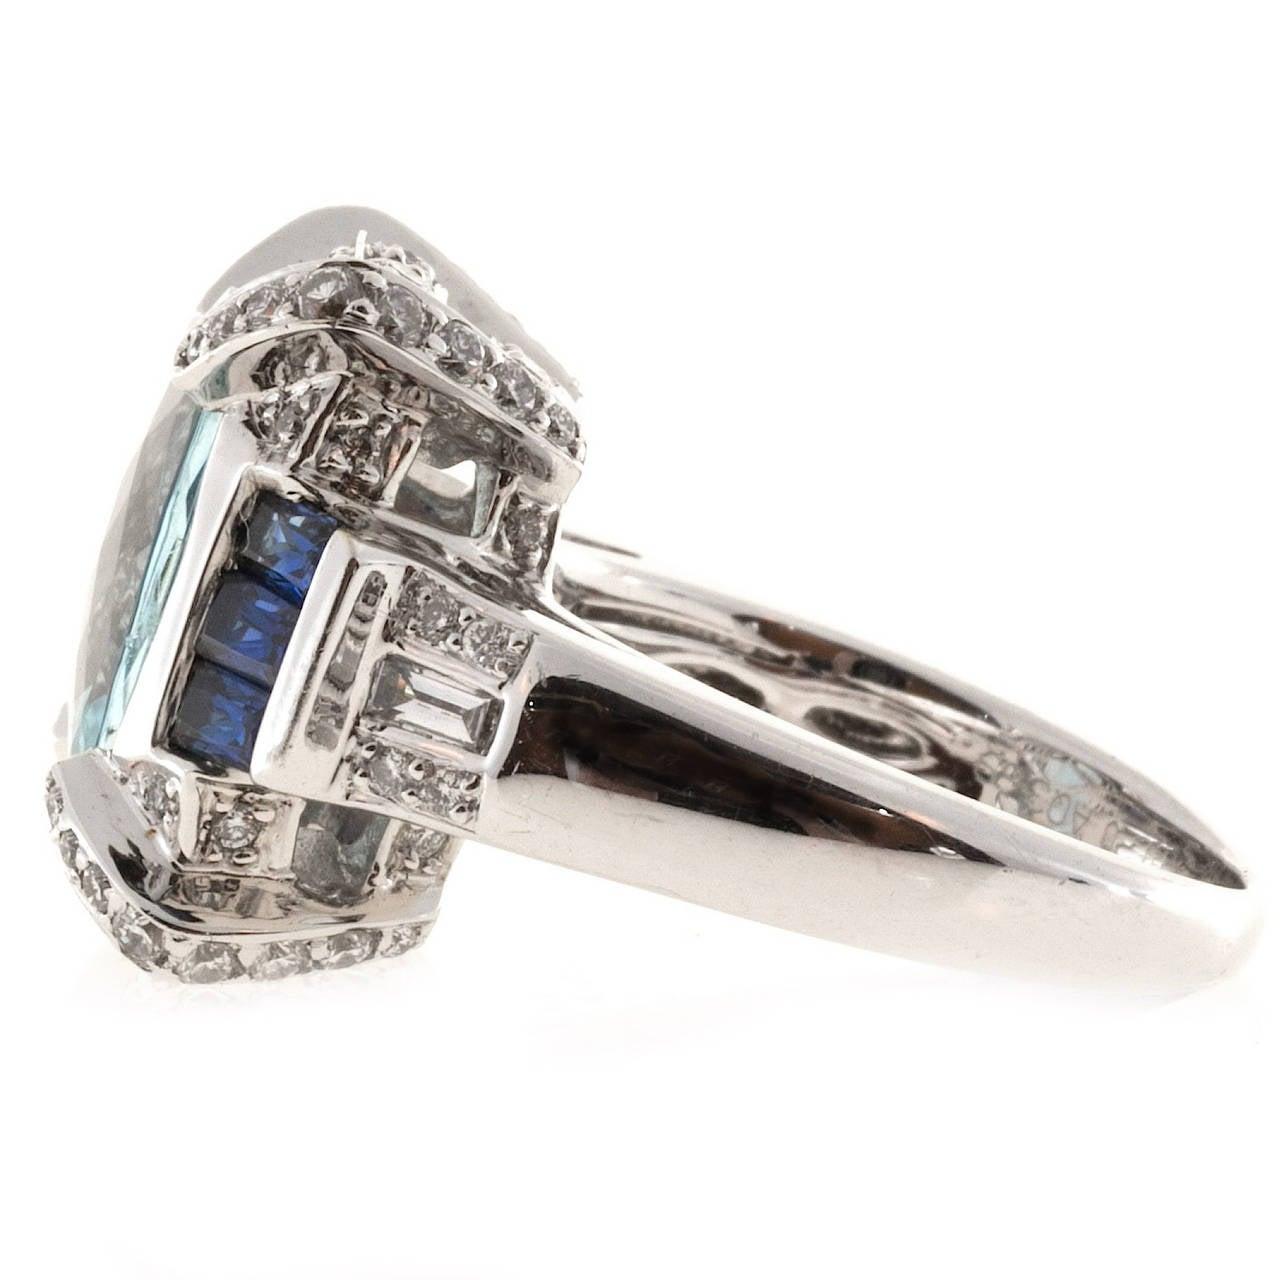 Charles Krypell Aquamarine Sapphire Diamond Gold Cocktail Ring 3